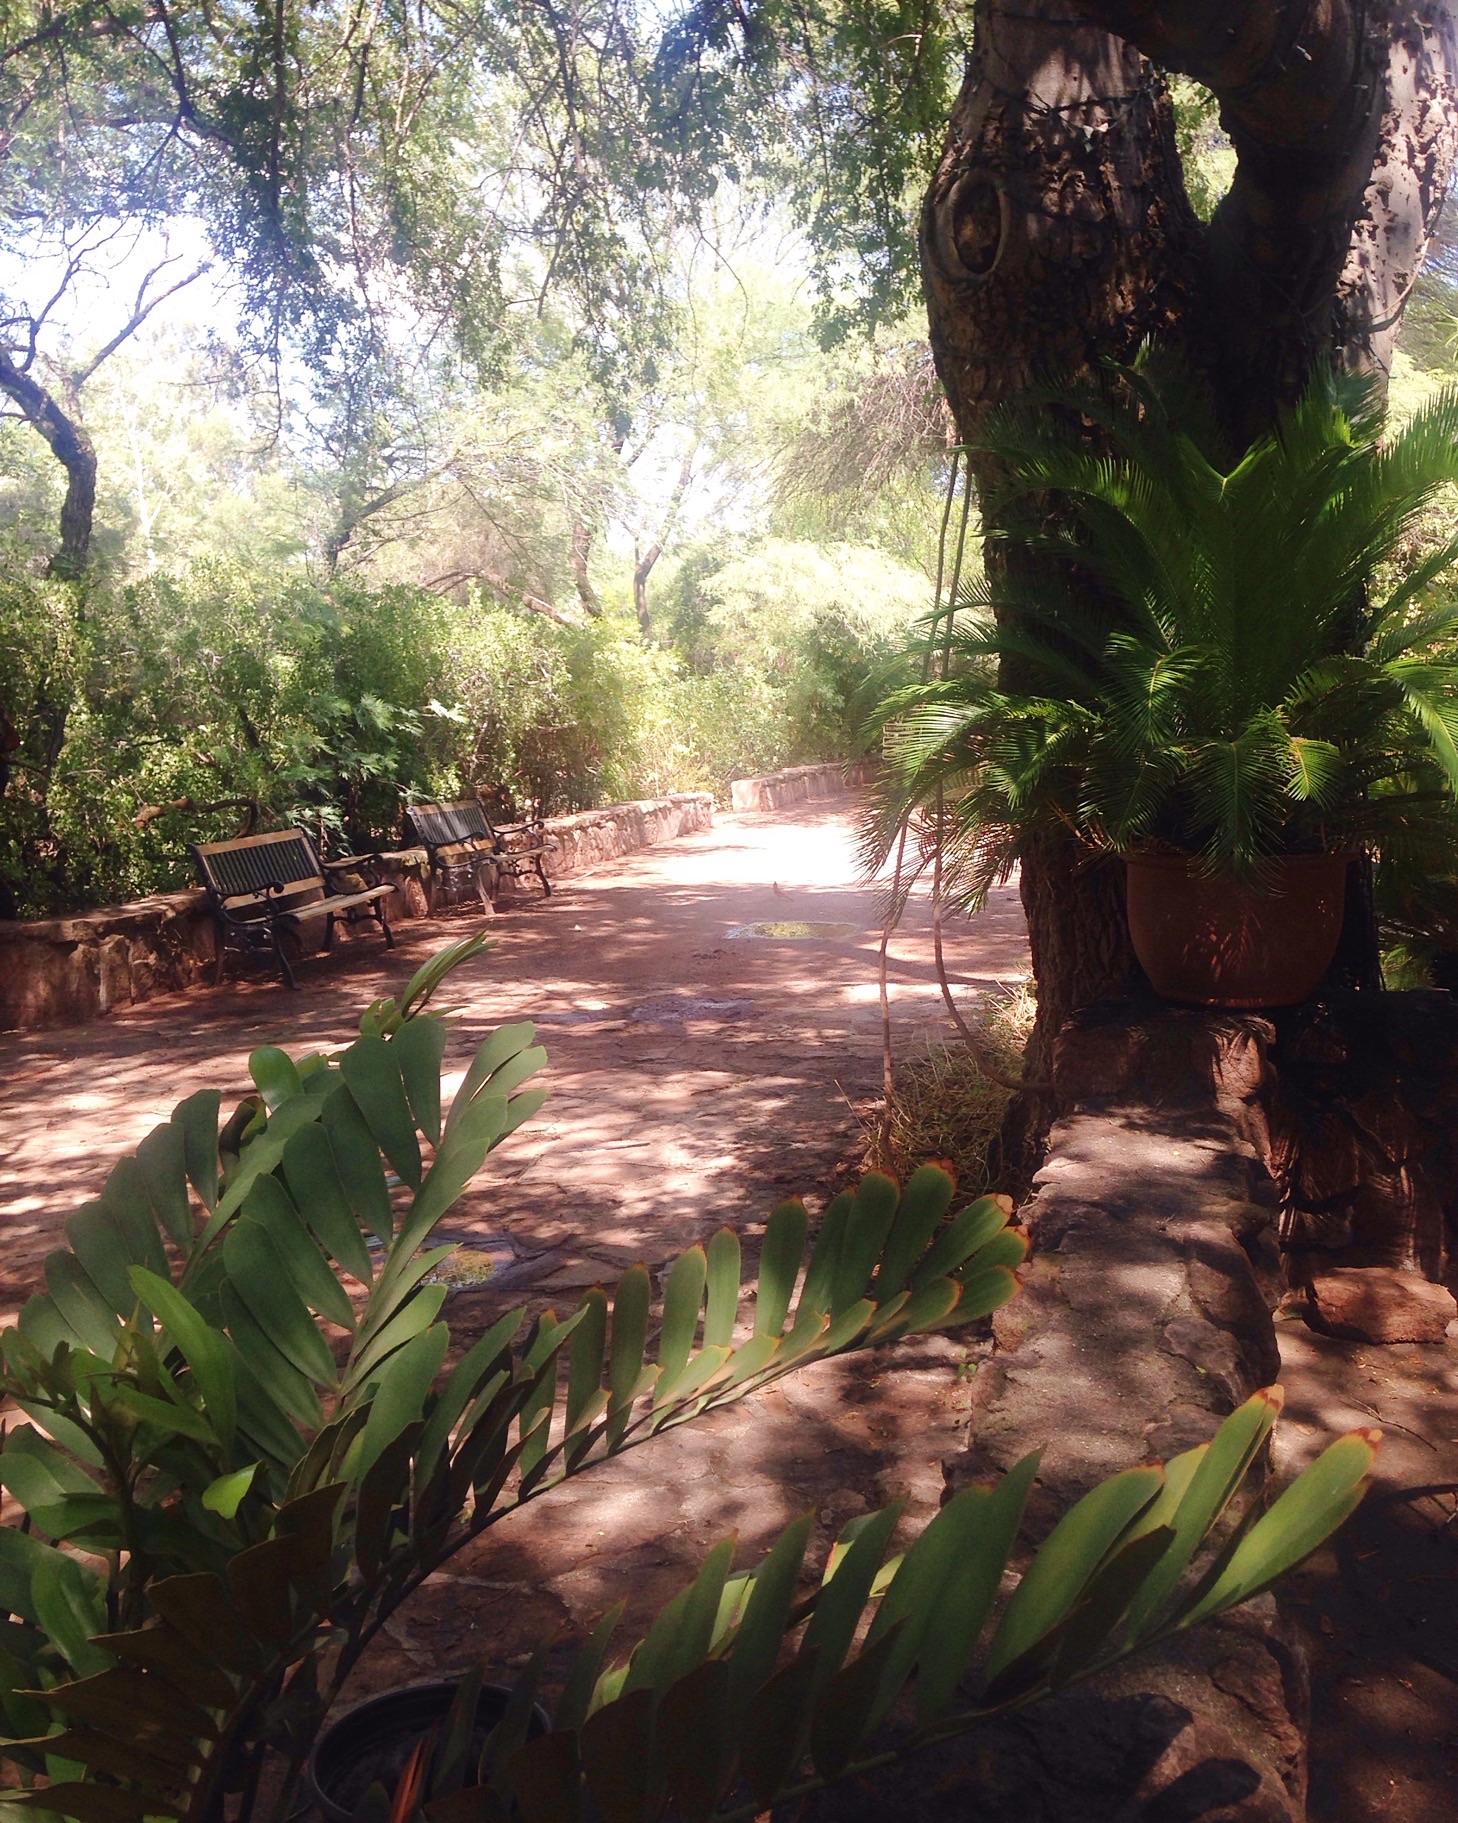 Boyce thompson arboretum - cardinal